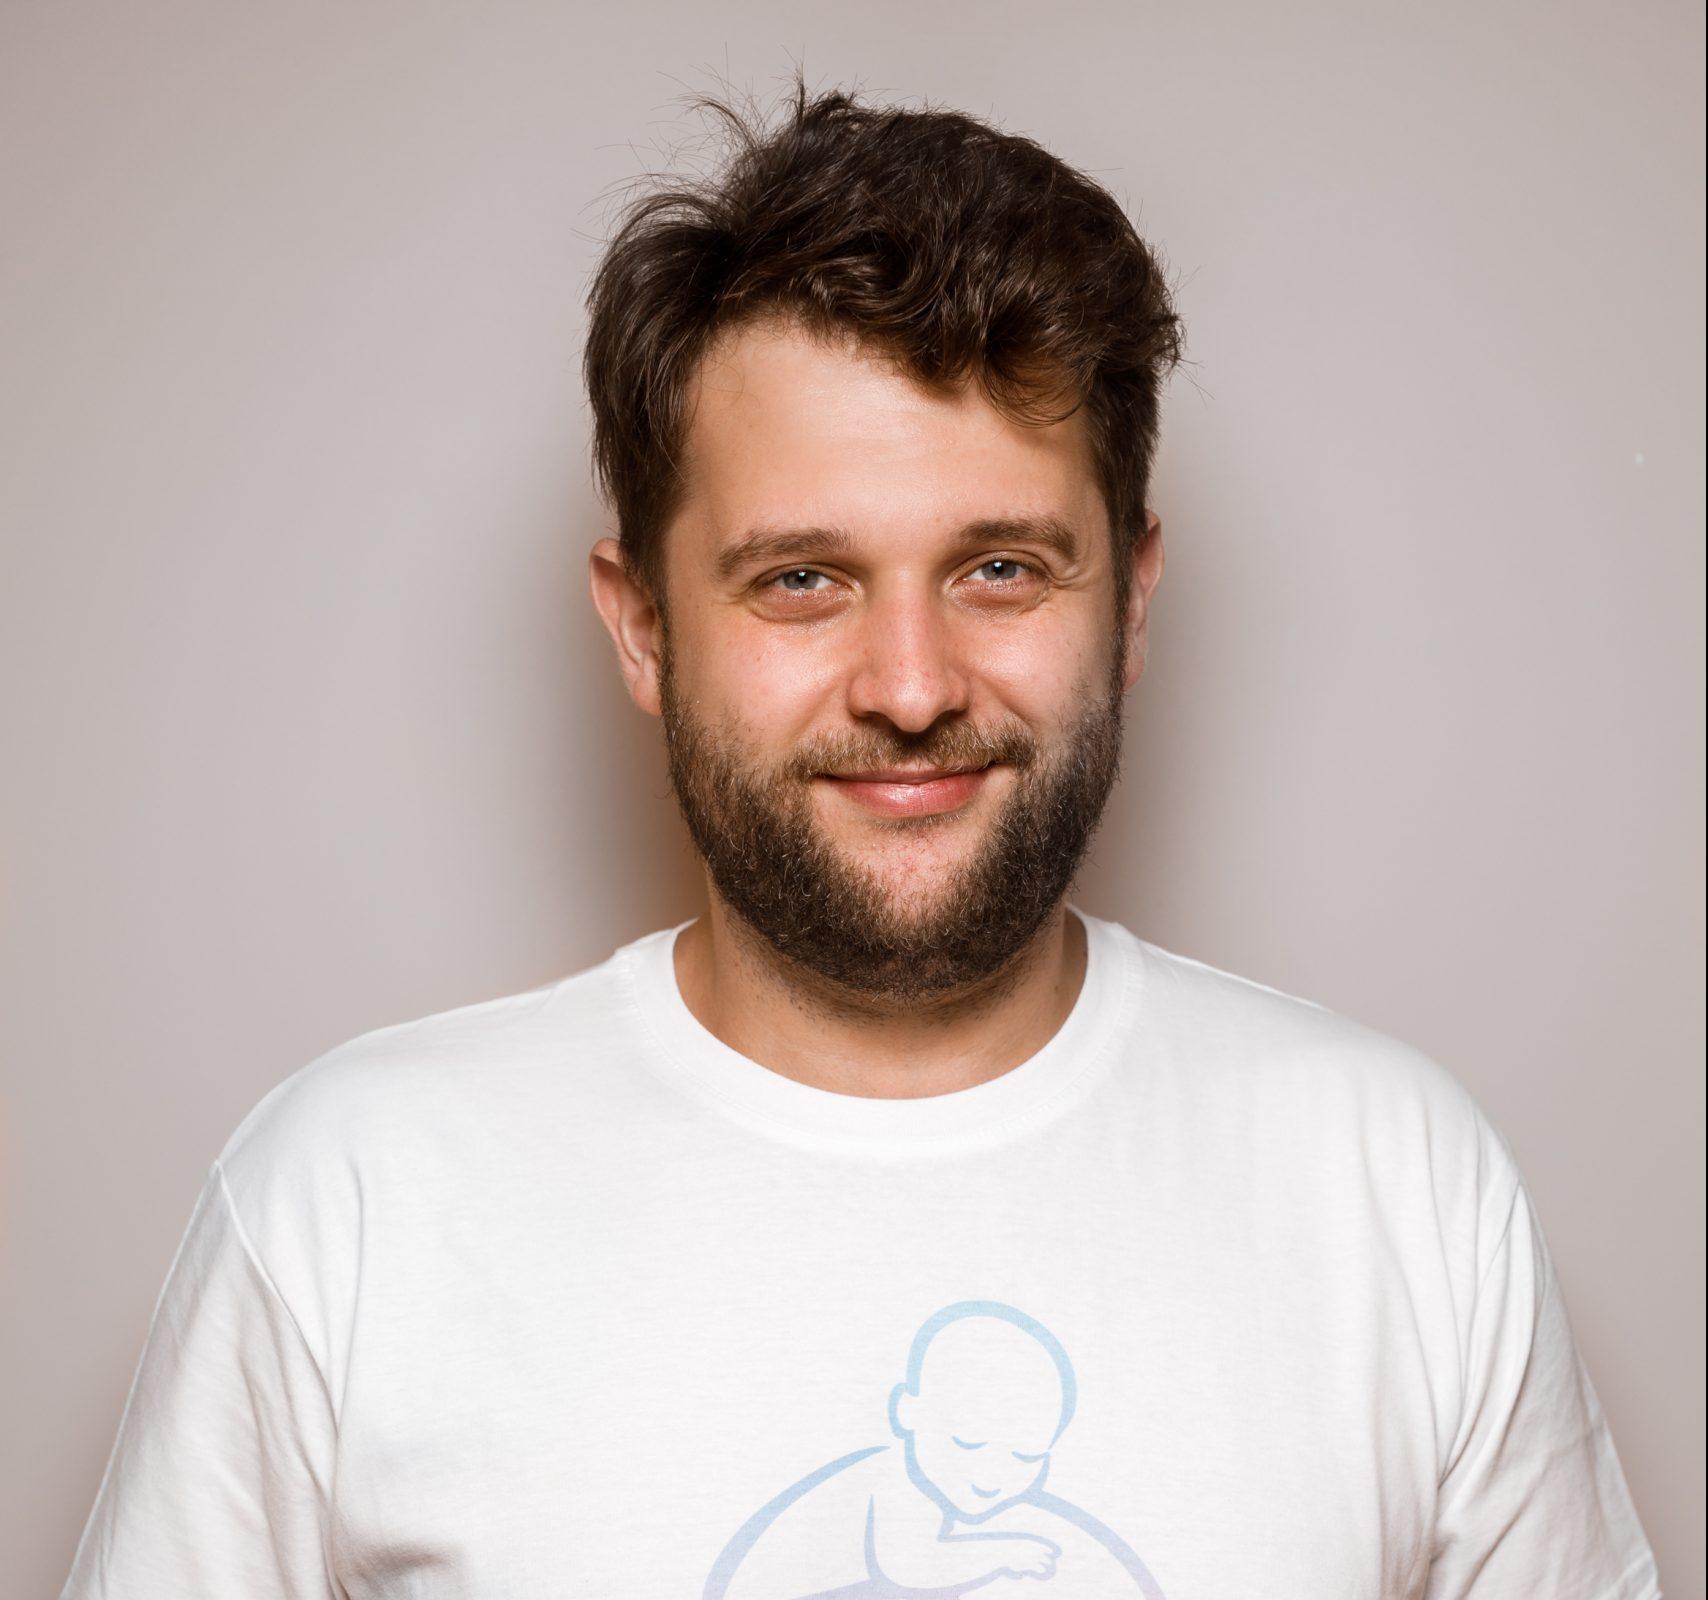 Igor Kalenichenko